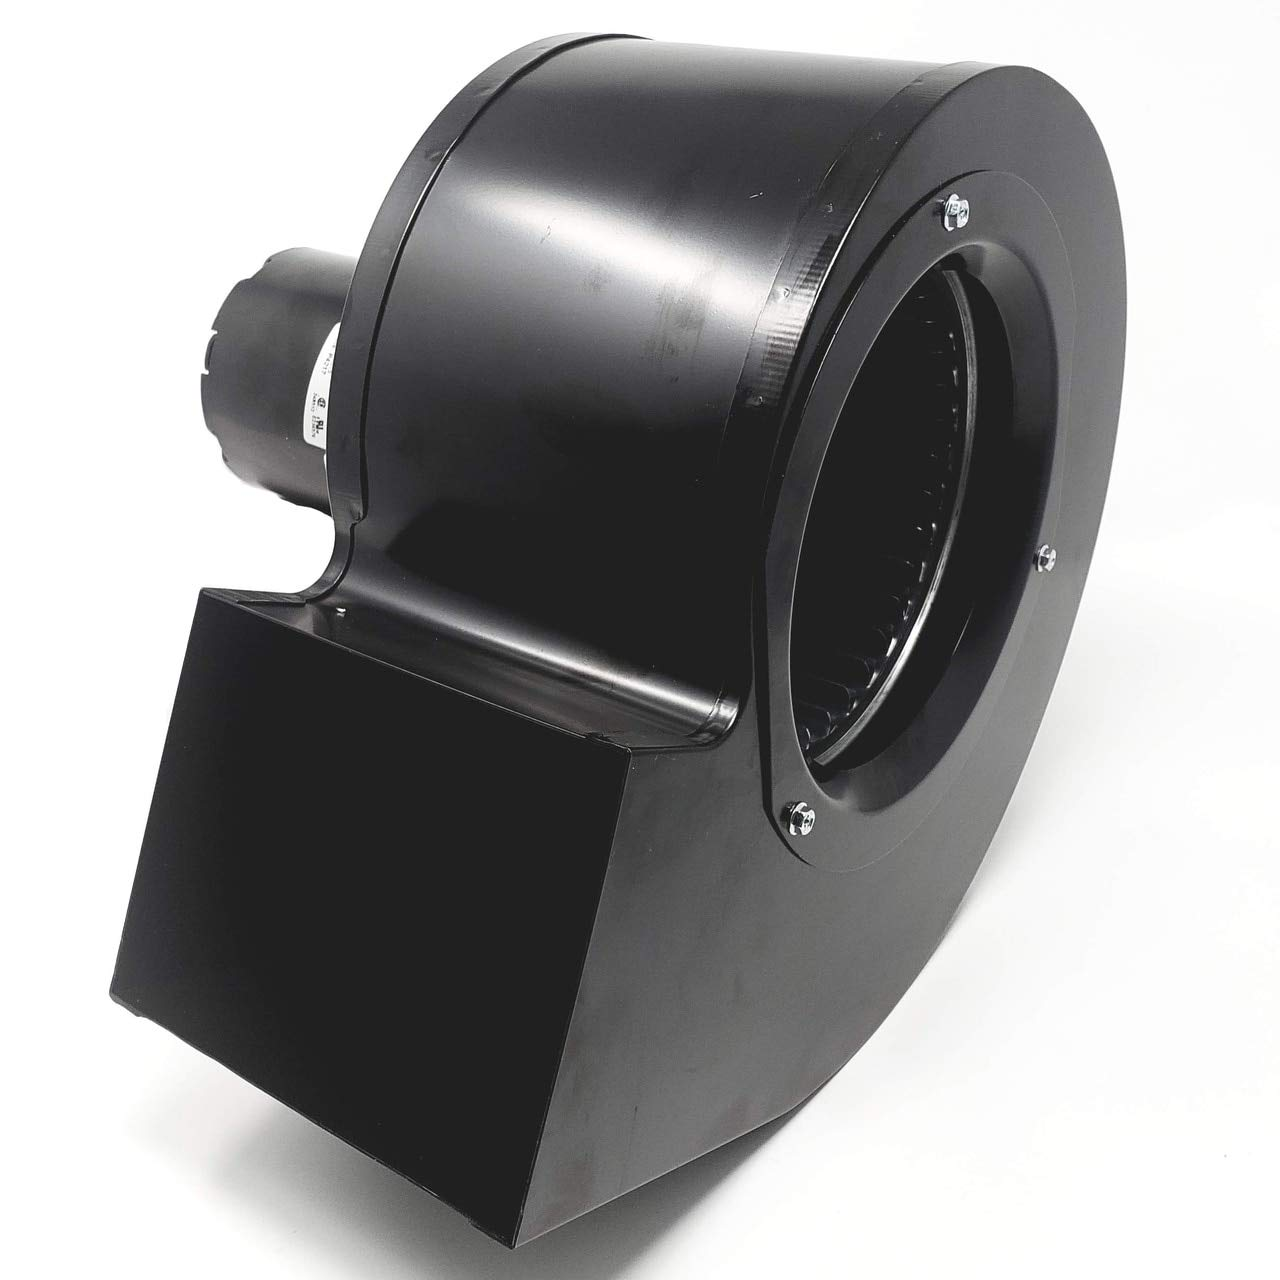 Rectangular Permanent Split Capacitor 3.3 Inch Blower w/Exhaust Mount | 2 Speed 500/325 CFM | 1625 RPM 115VAC 60Hz (Without Exhaust Mount)